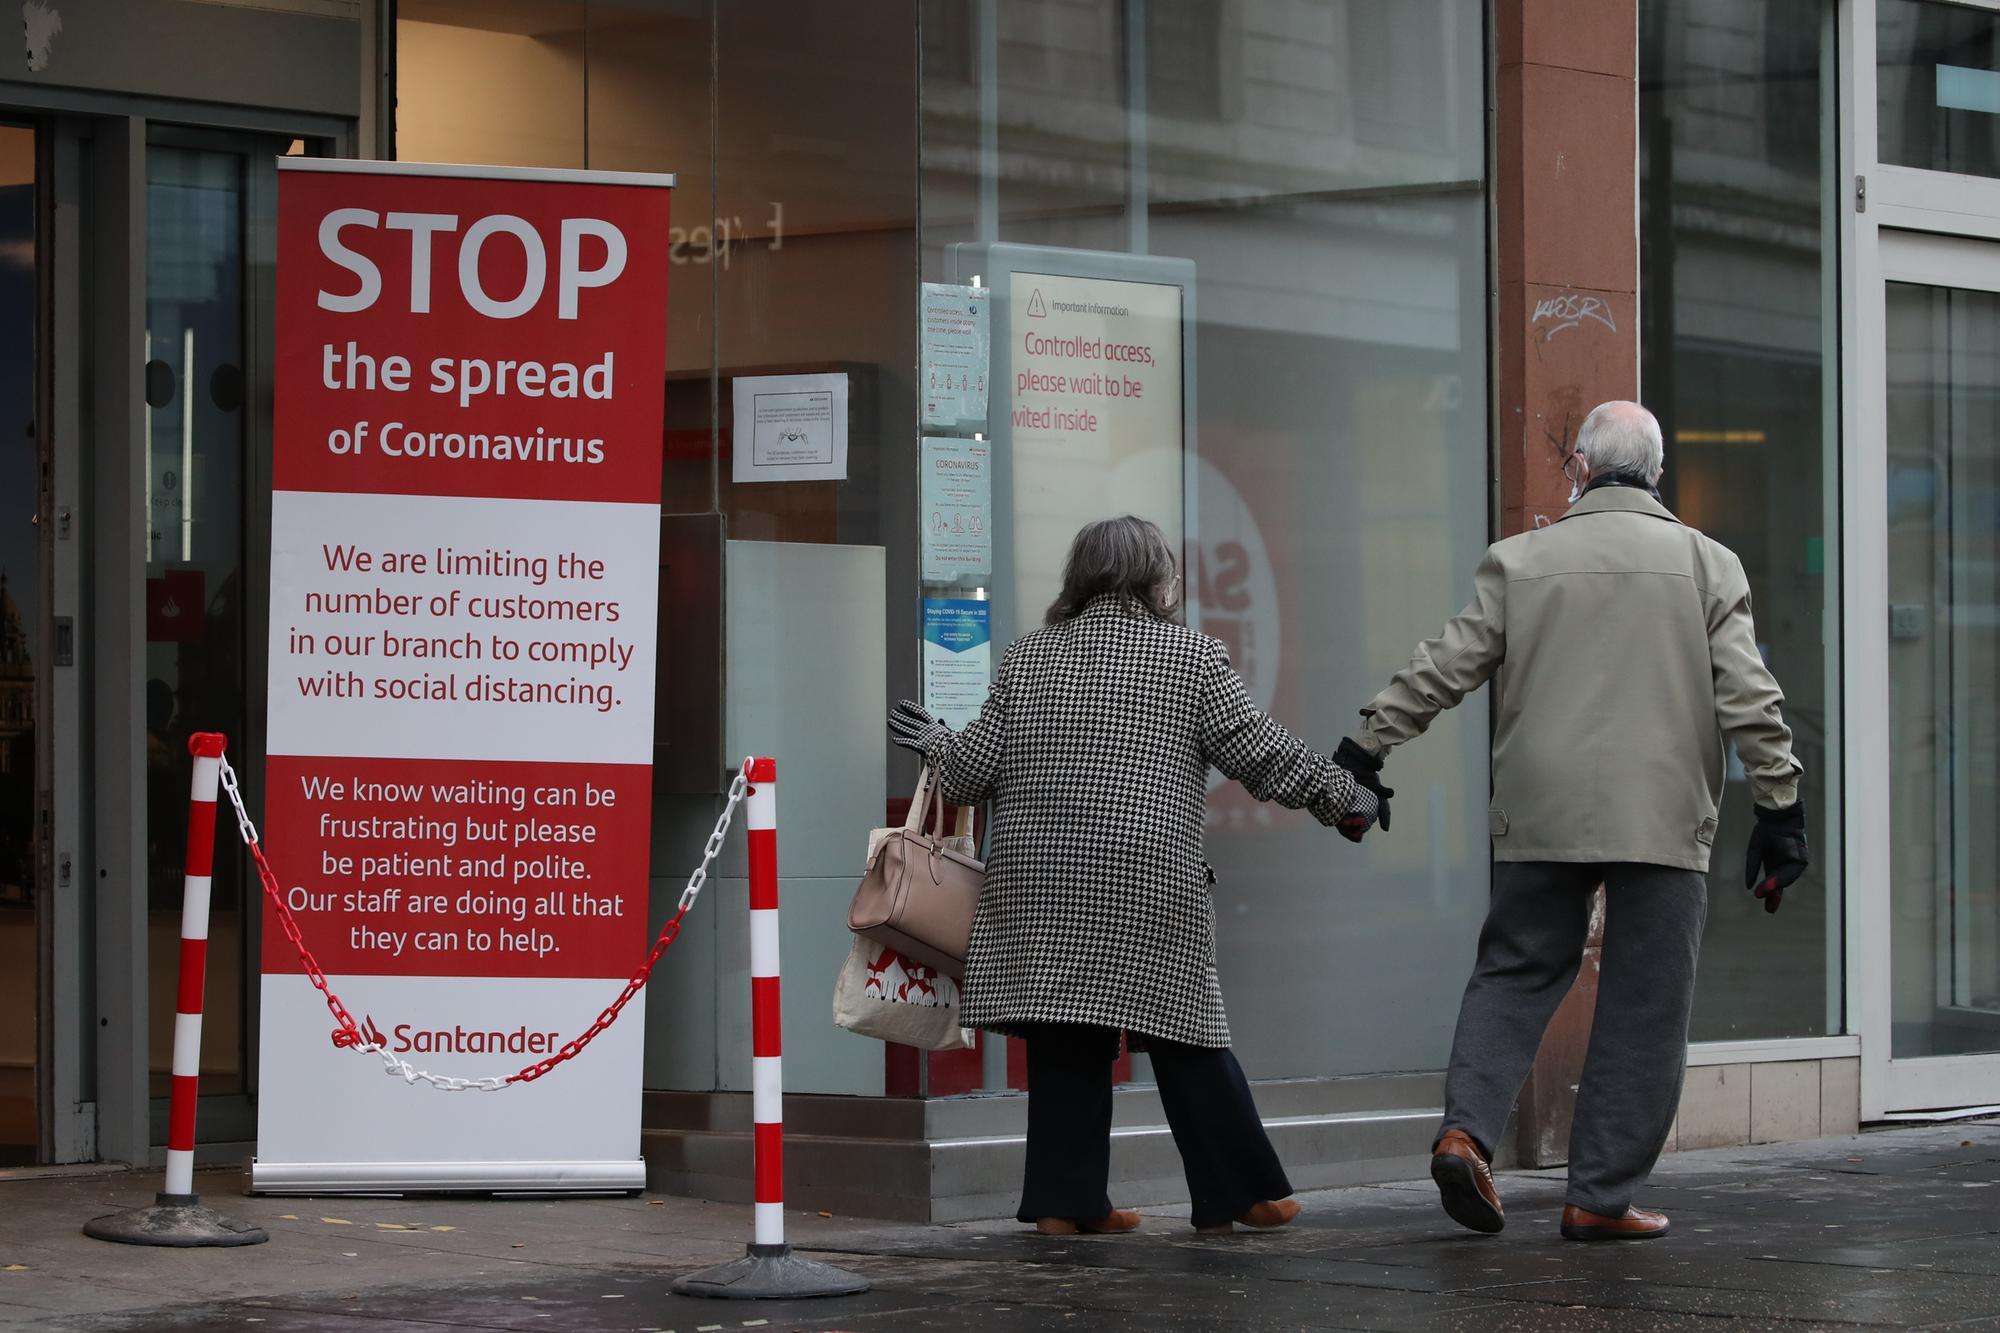 scotsman.com - Conor Matchett - Scotland 'learning from experience' in examining hotel quarantine plans